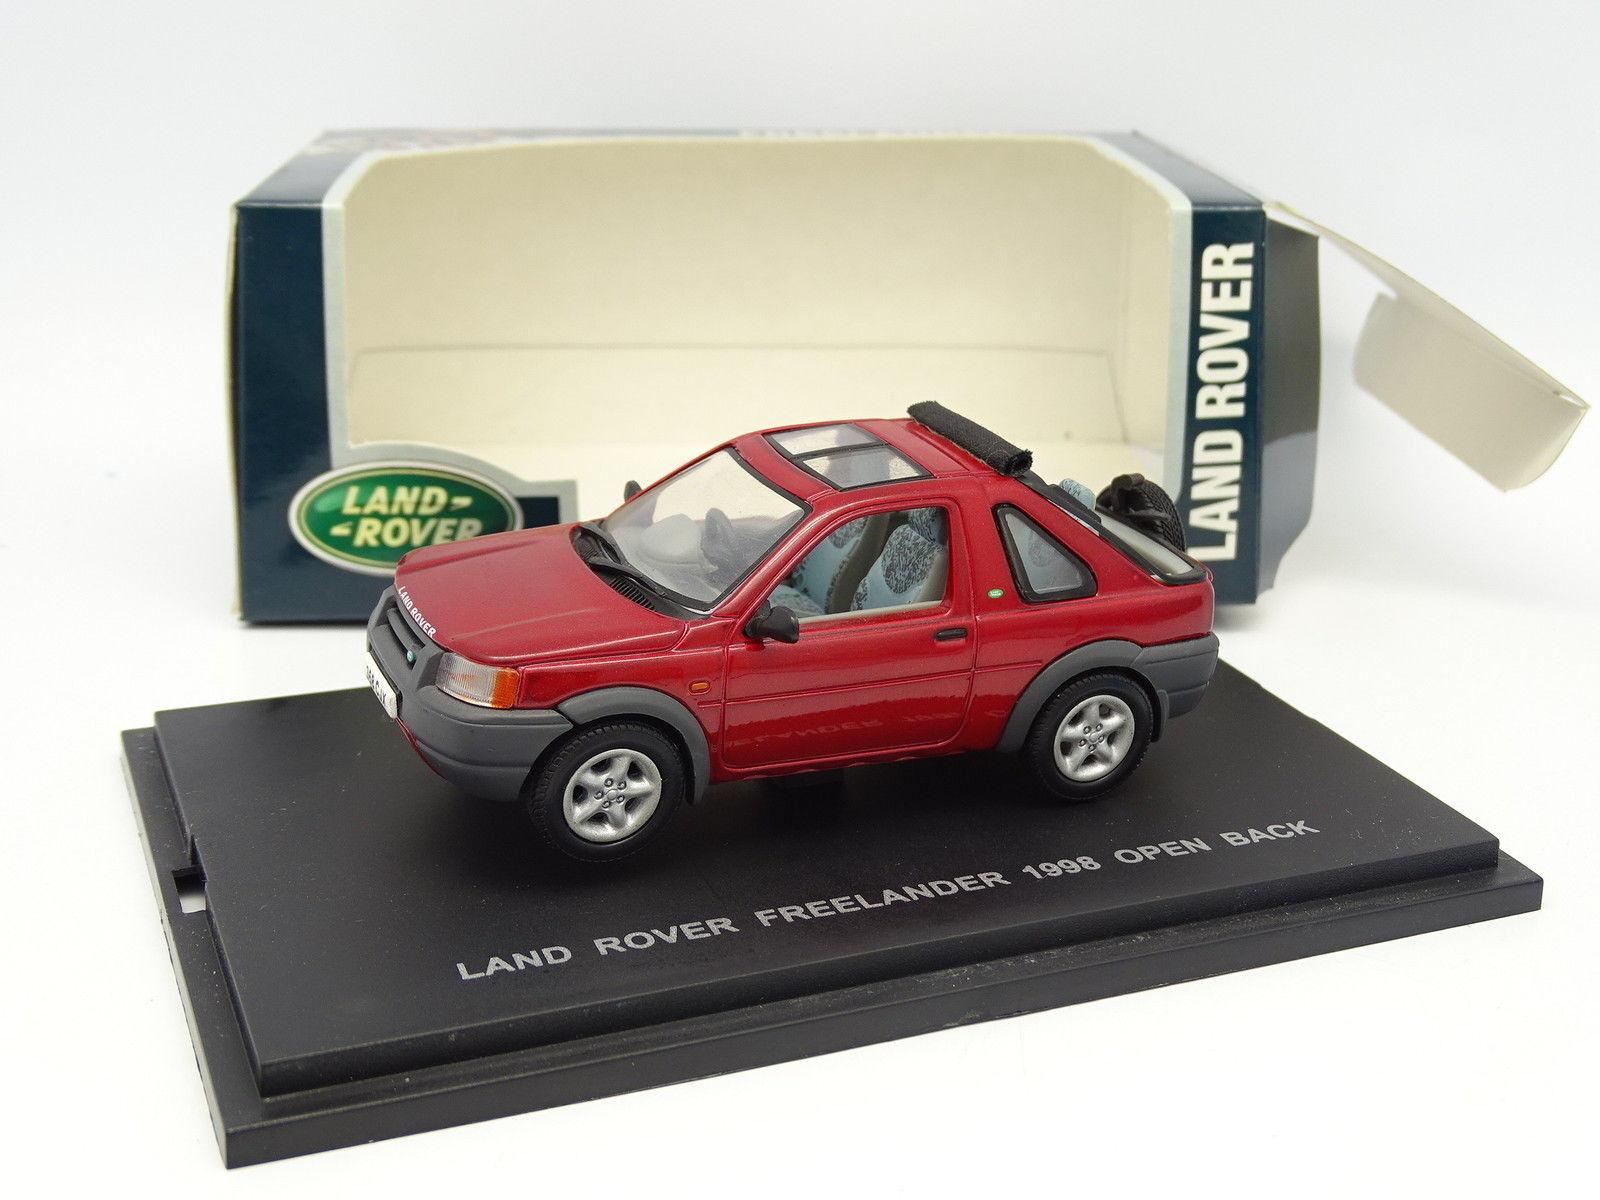 Uh Uh Uh 1 43 - Land Rover Freelander 1998 red 8fd620